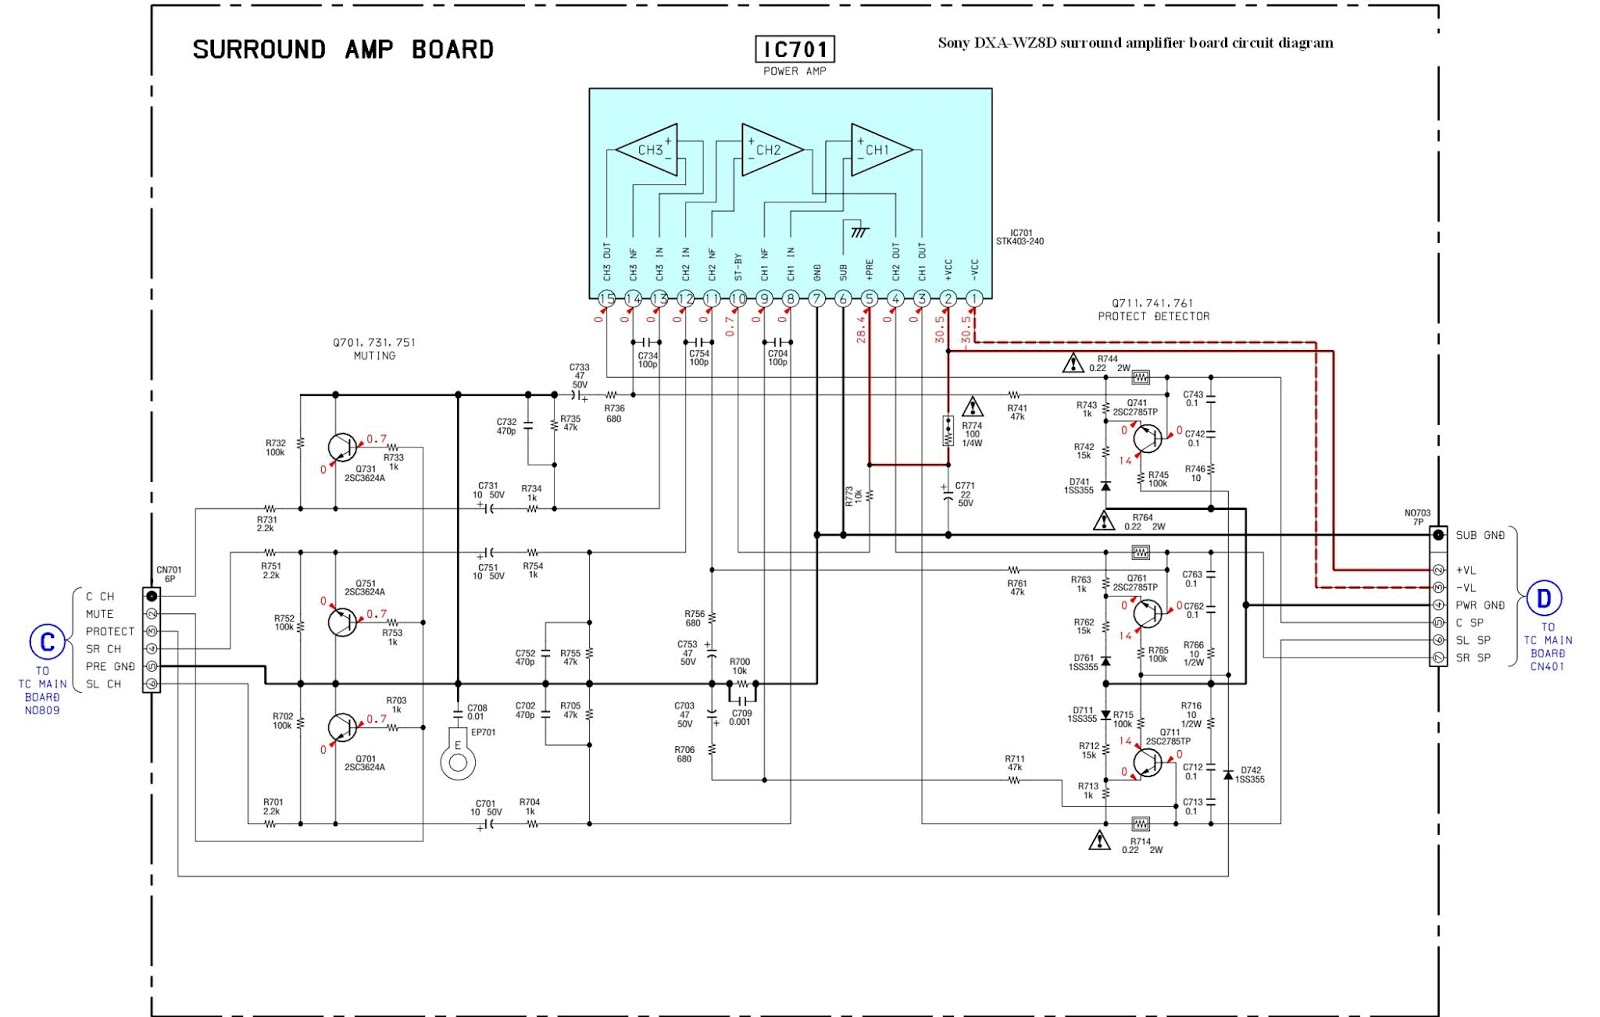 medium resolution of sony dxa wz8d surround amplifier board circuit diagram